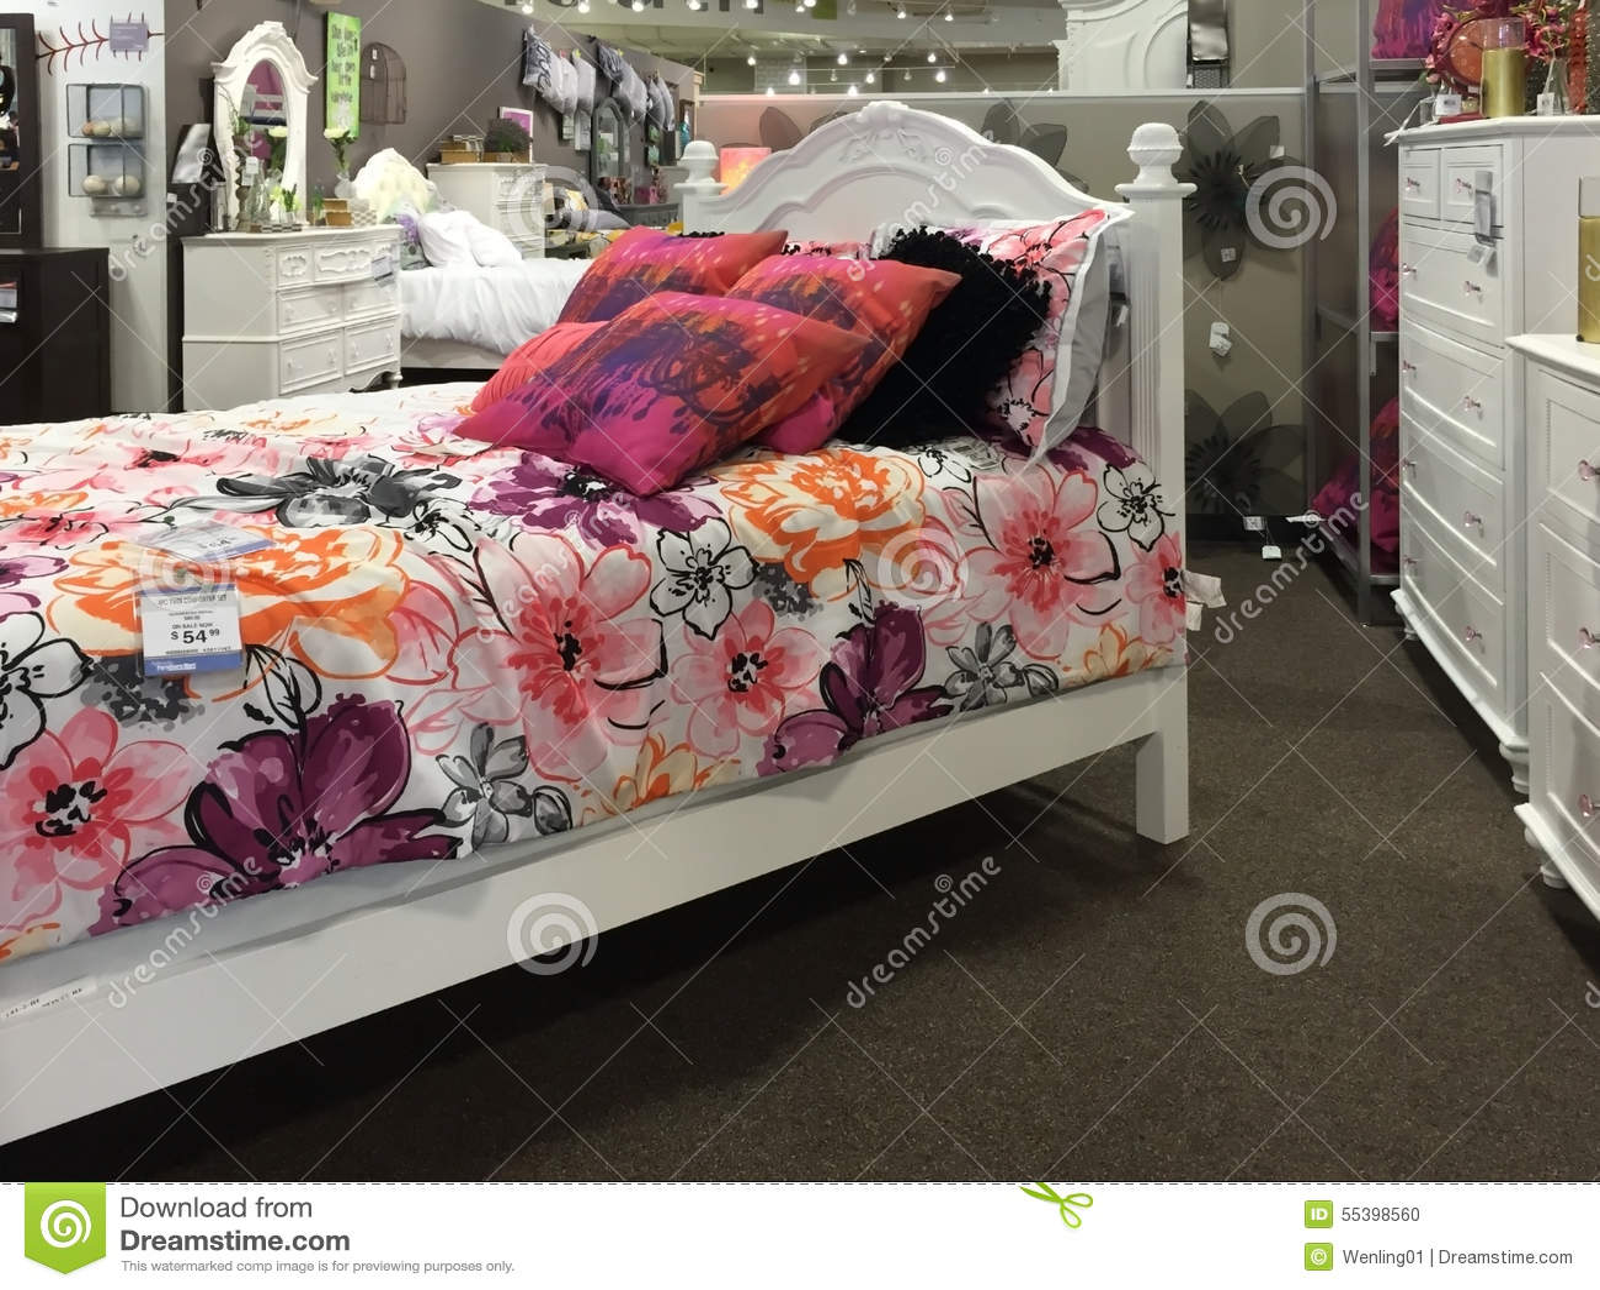 Selling Bedroom Furniture Children Bedroom Furniture Selling Editorial Image Image 55398560